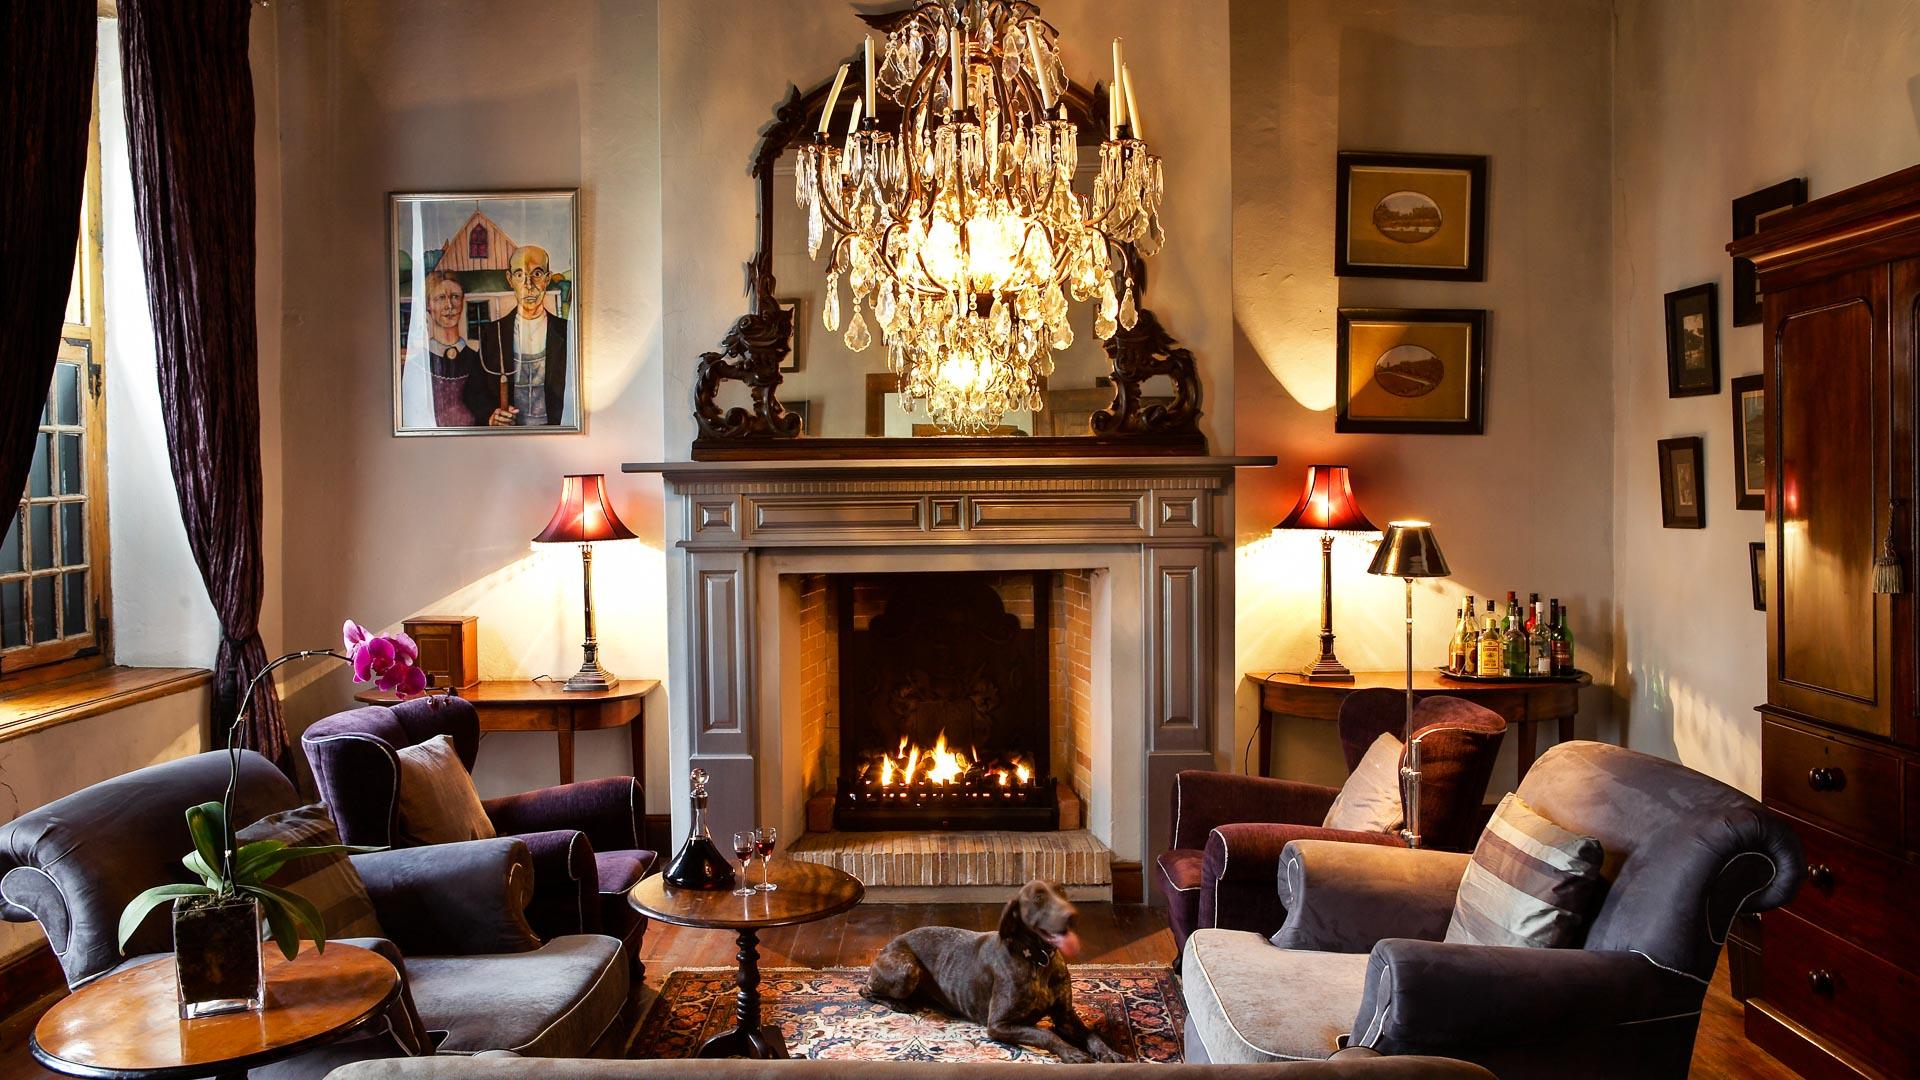 manor-house_Hawksmoor-House-021-1920px-400kb-Slider-16x9